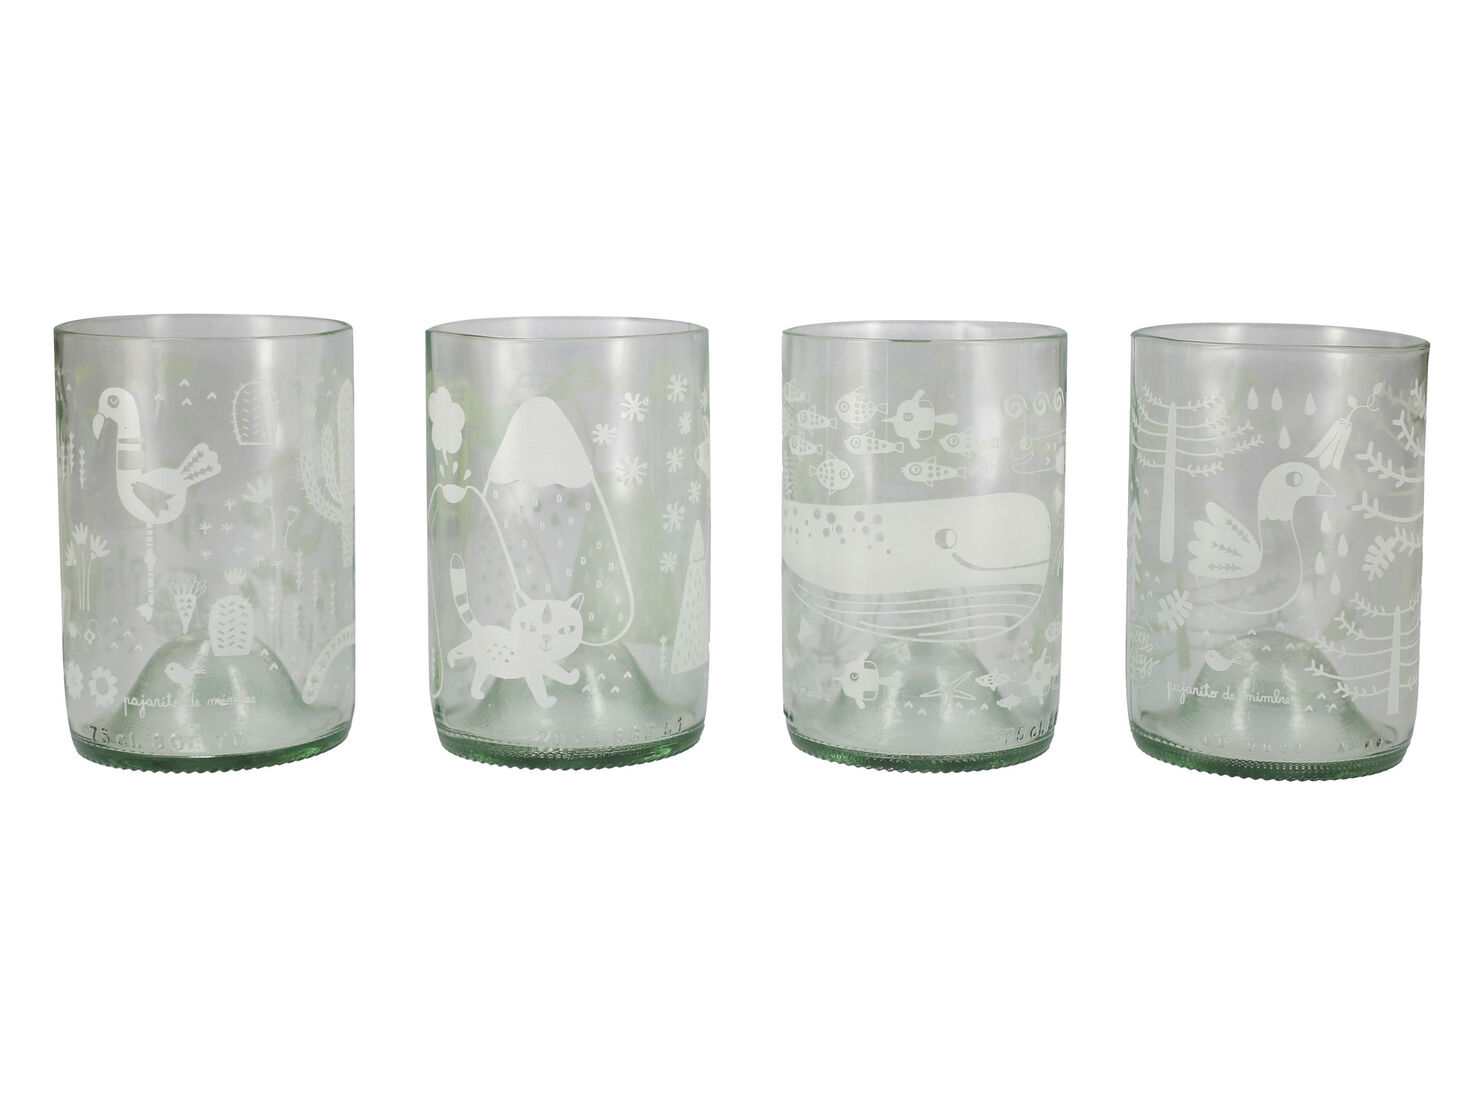 a267572050e8 Set de 4 Vasos Flora y Fauna + Packing Green Glass